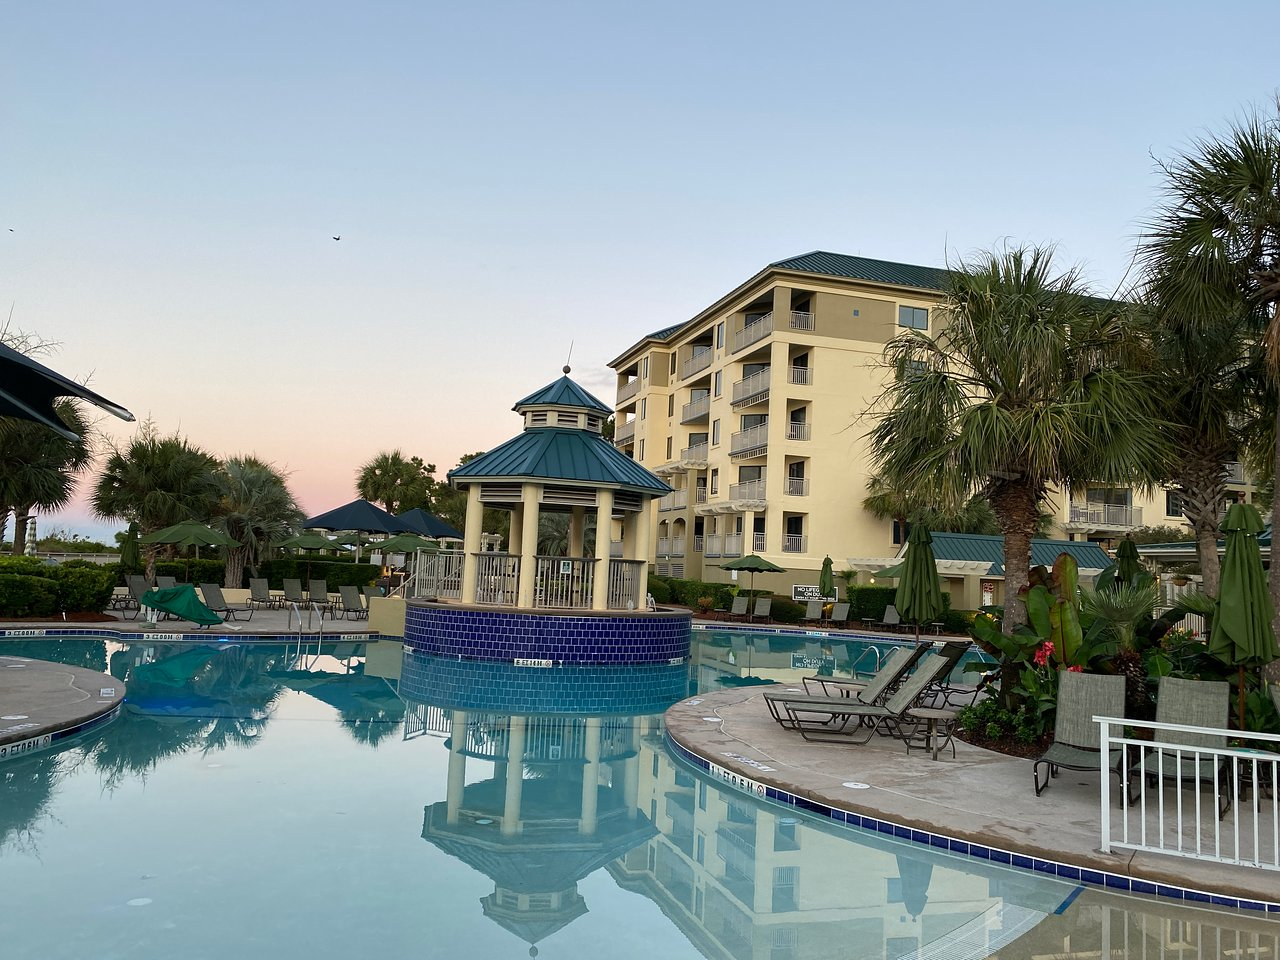 Marriott's Barony Beach Club Pool Area